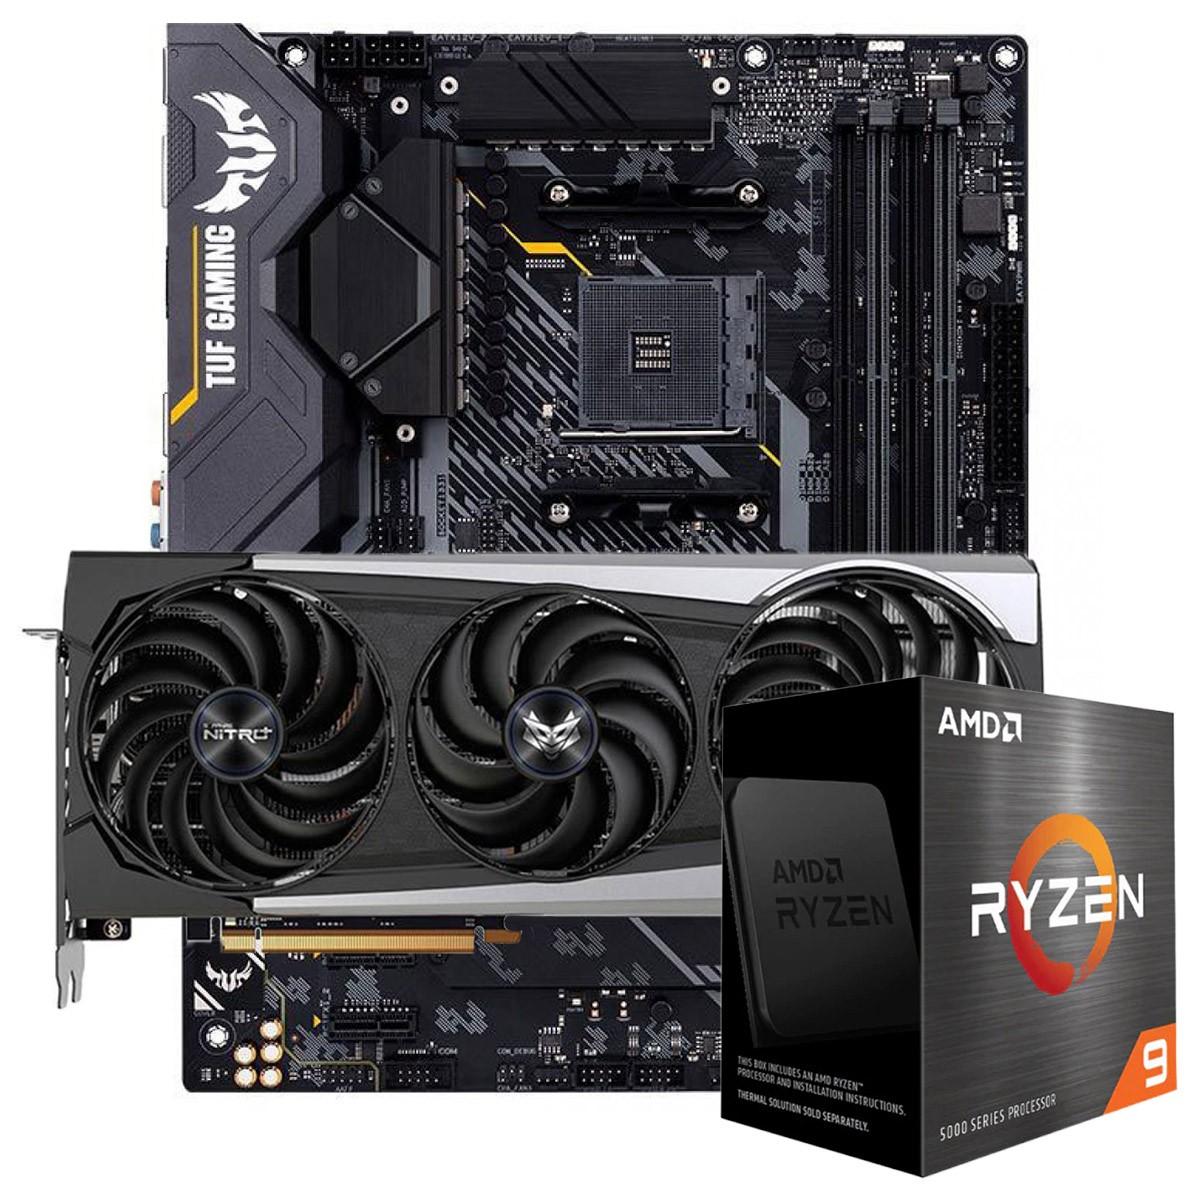 Kit Upgrade Sapphire Radeon RX 6700 XT + AMD Ryzen 9 5900X + ASUS TUF Gaming X570-Plus